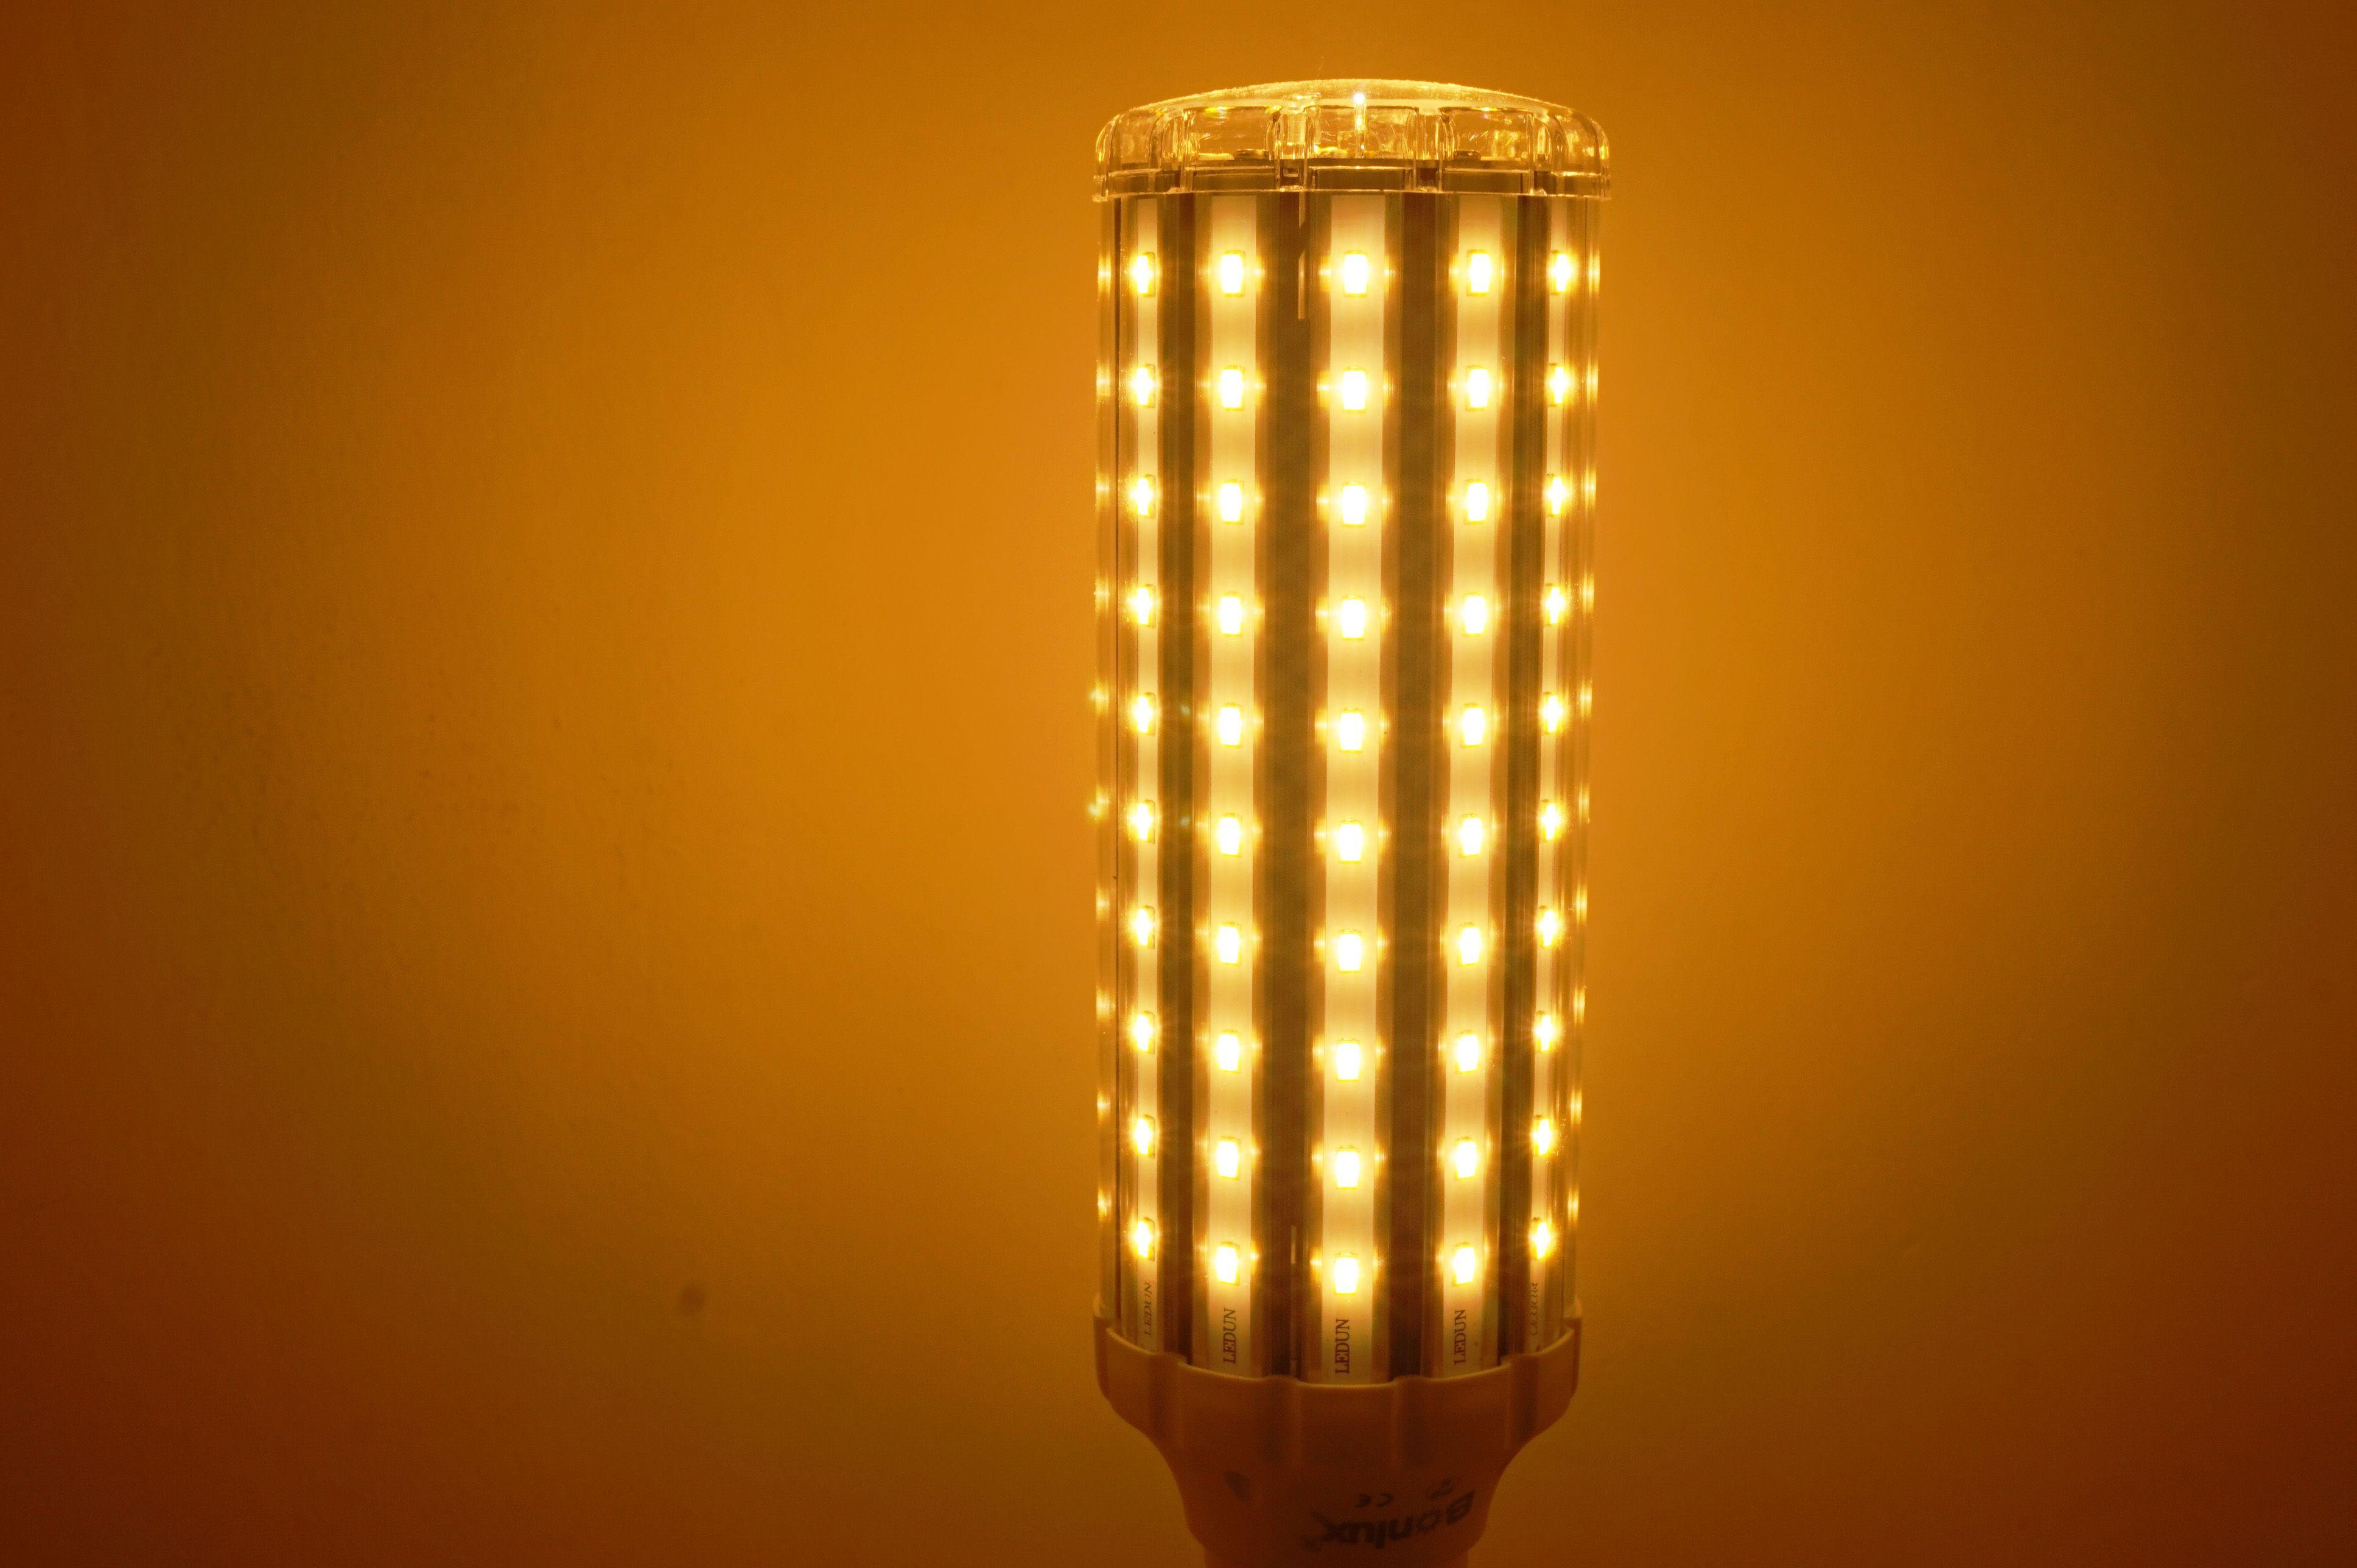 LED Corn Bulb Mogul Screw Base E39 E40 High Bay Retrofit LED Bulb 100W Daylight